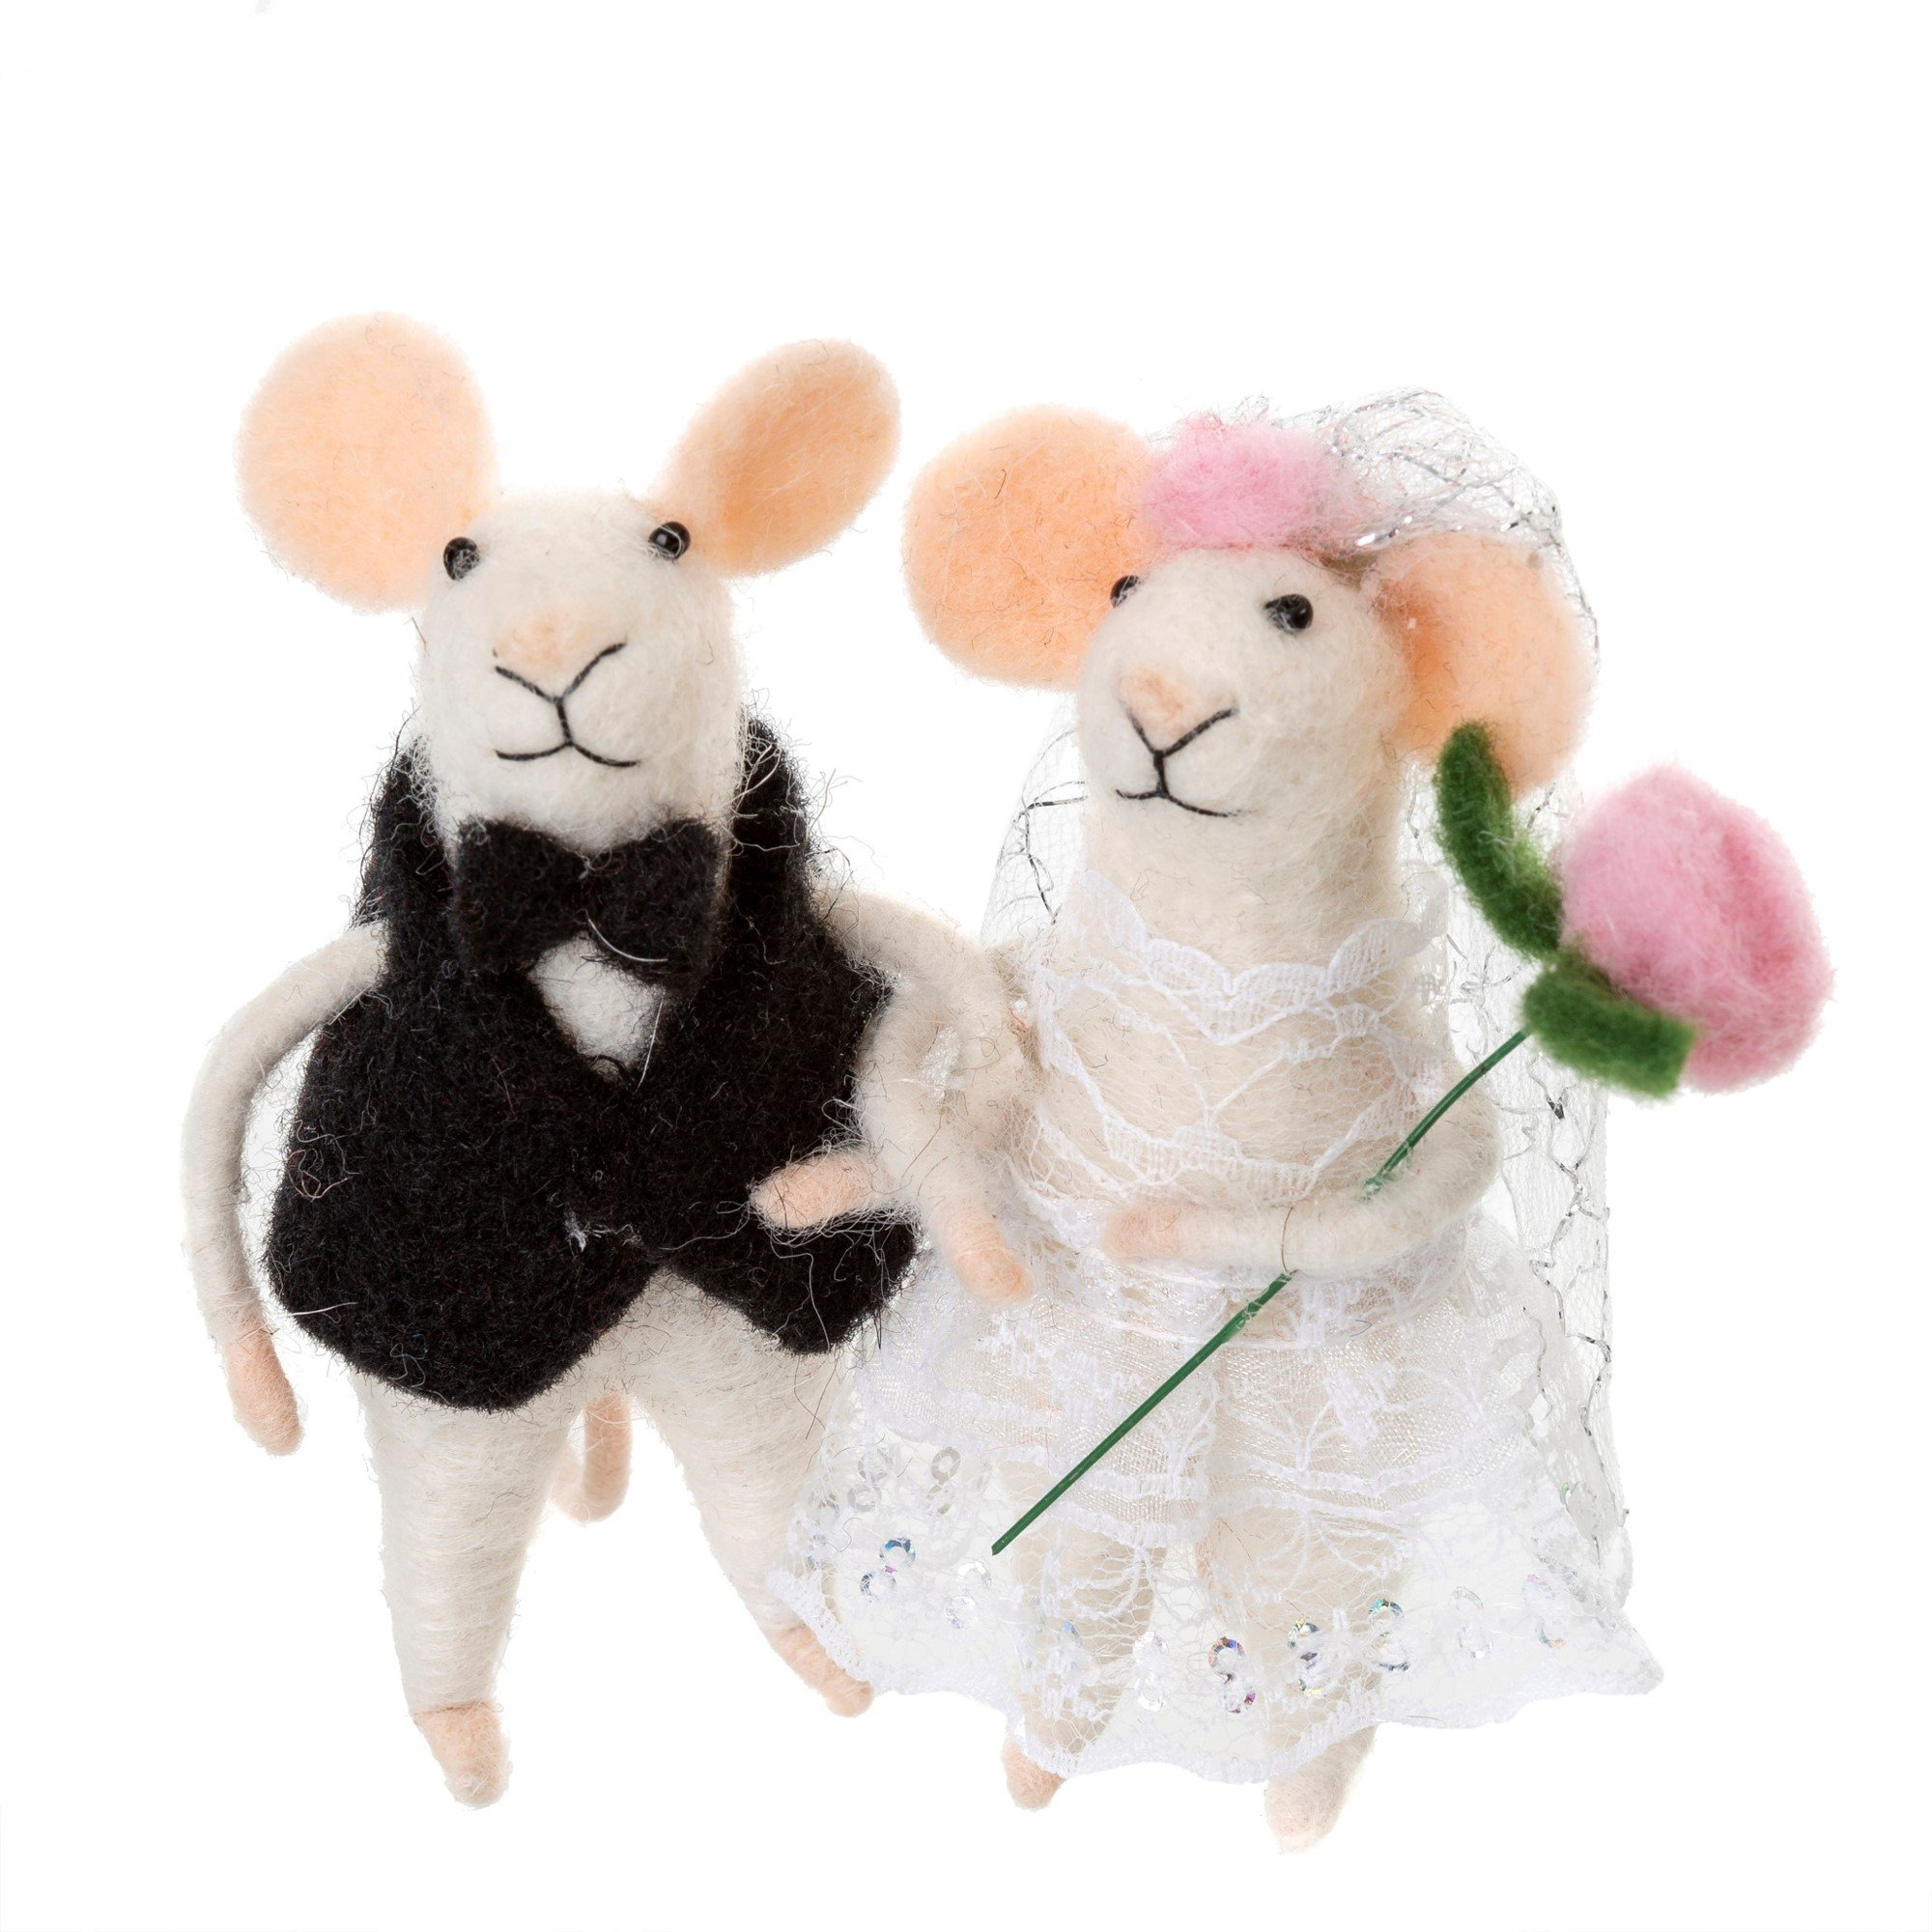 Indaba Newlywed Felt Mice Orn Ornament